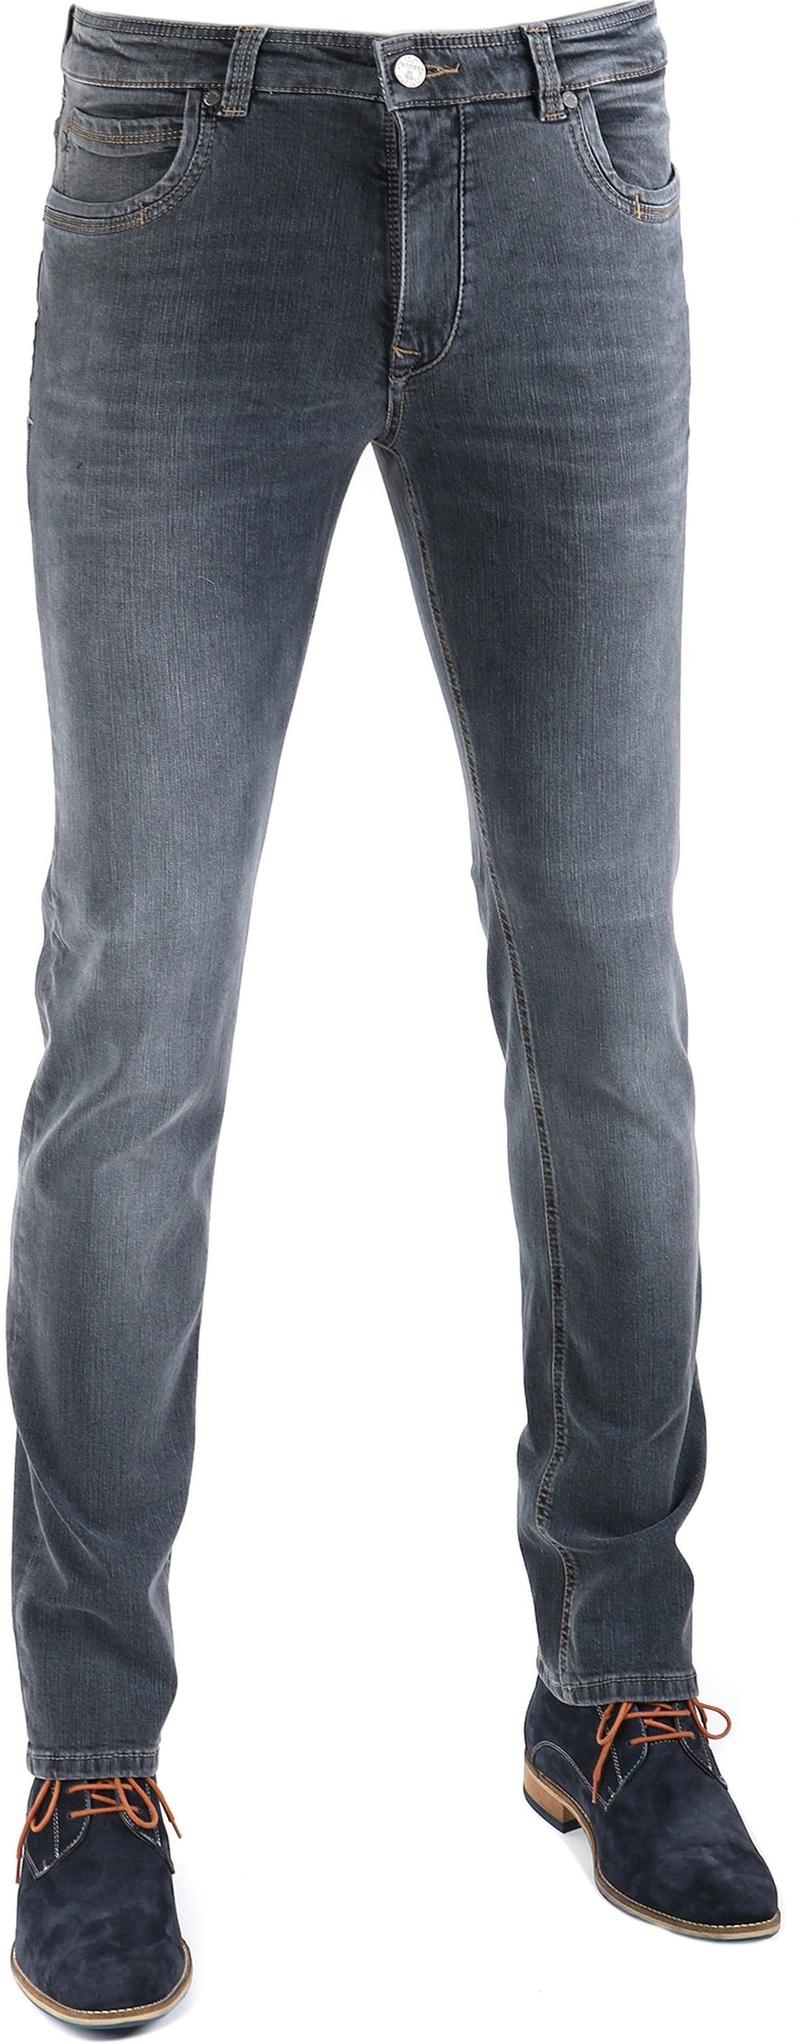 Gardeur Batu Jeans Modern-Fit Anthrazit Foto 0